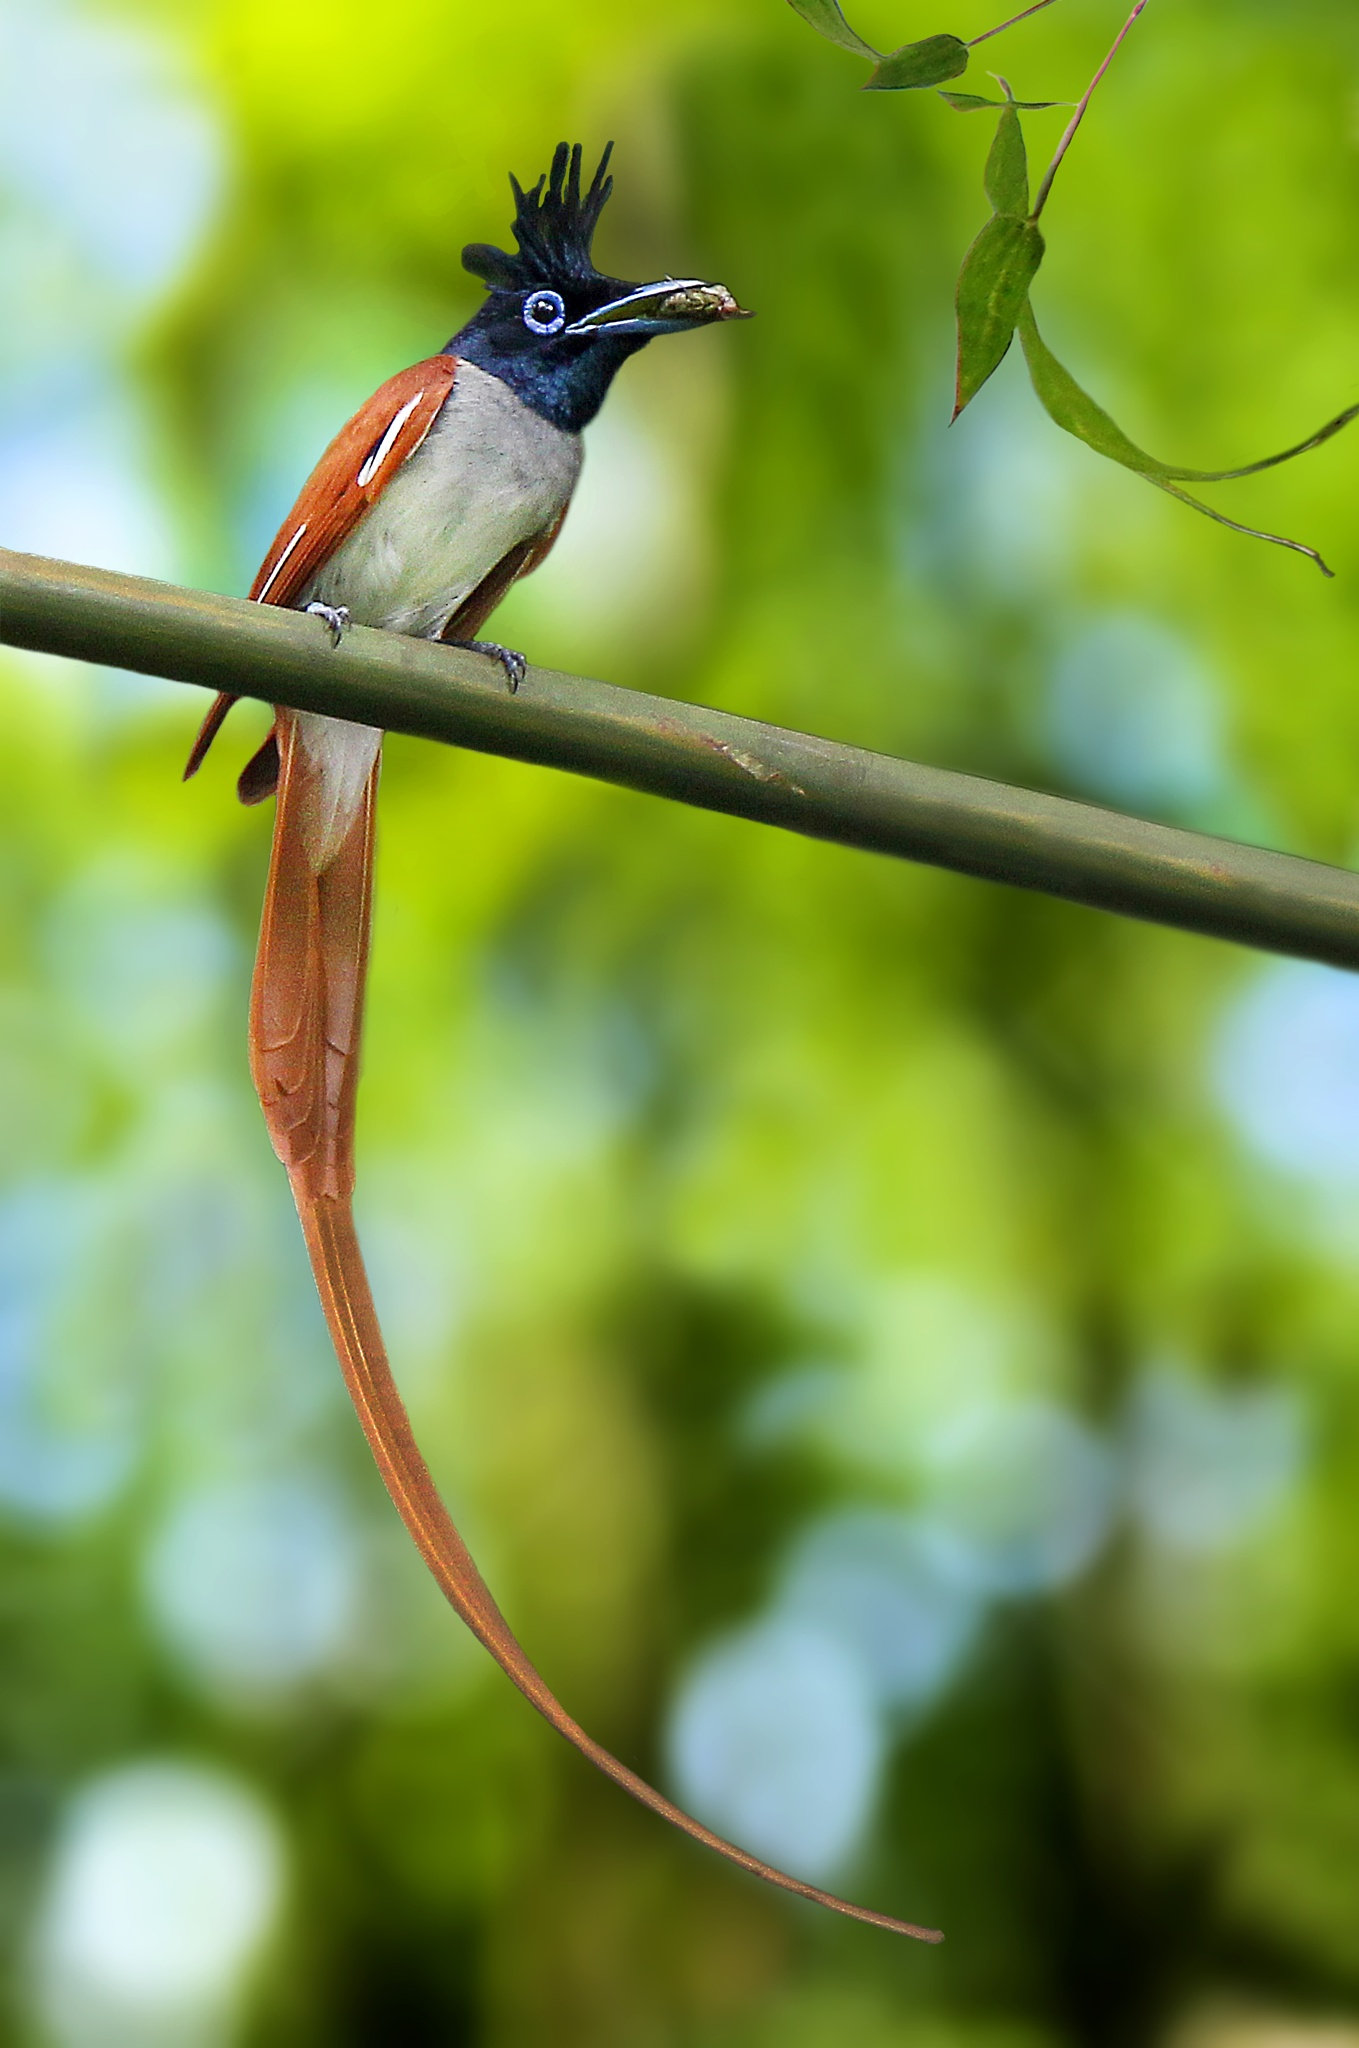 Asian Paradise Flycatcher by ParthaChakraborty